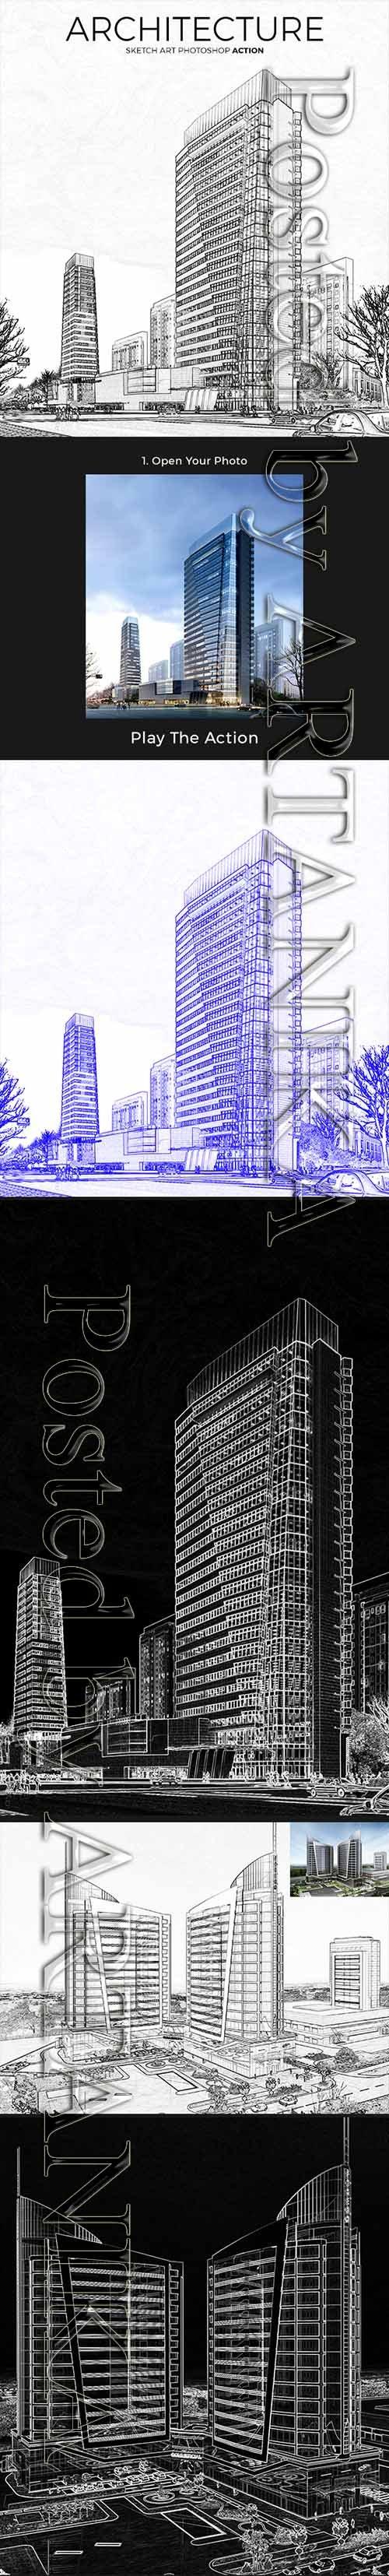 GraphicRiver - Architecture Sketch Art Photoshop Action 21403946